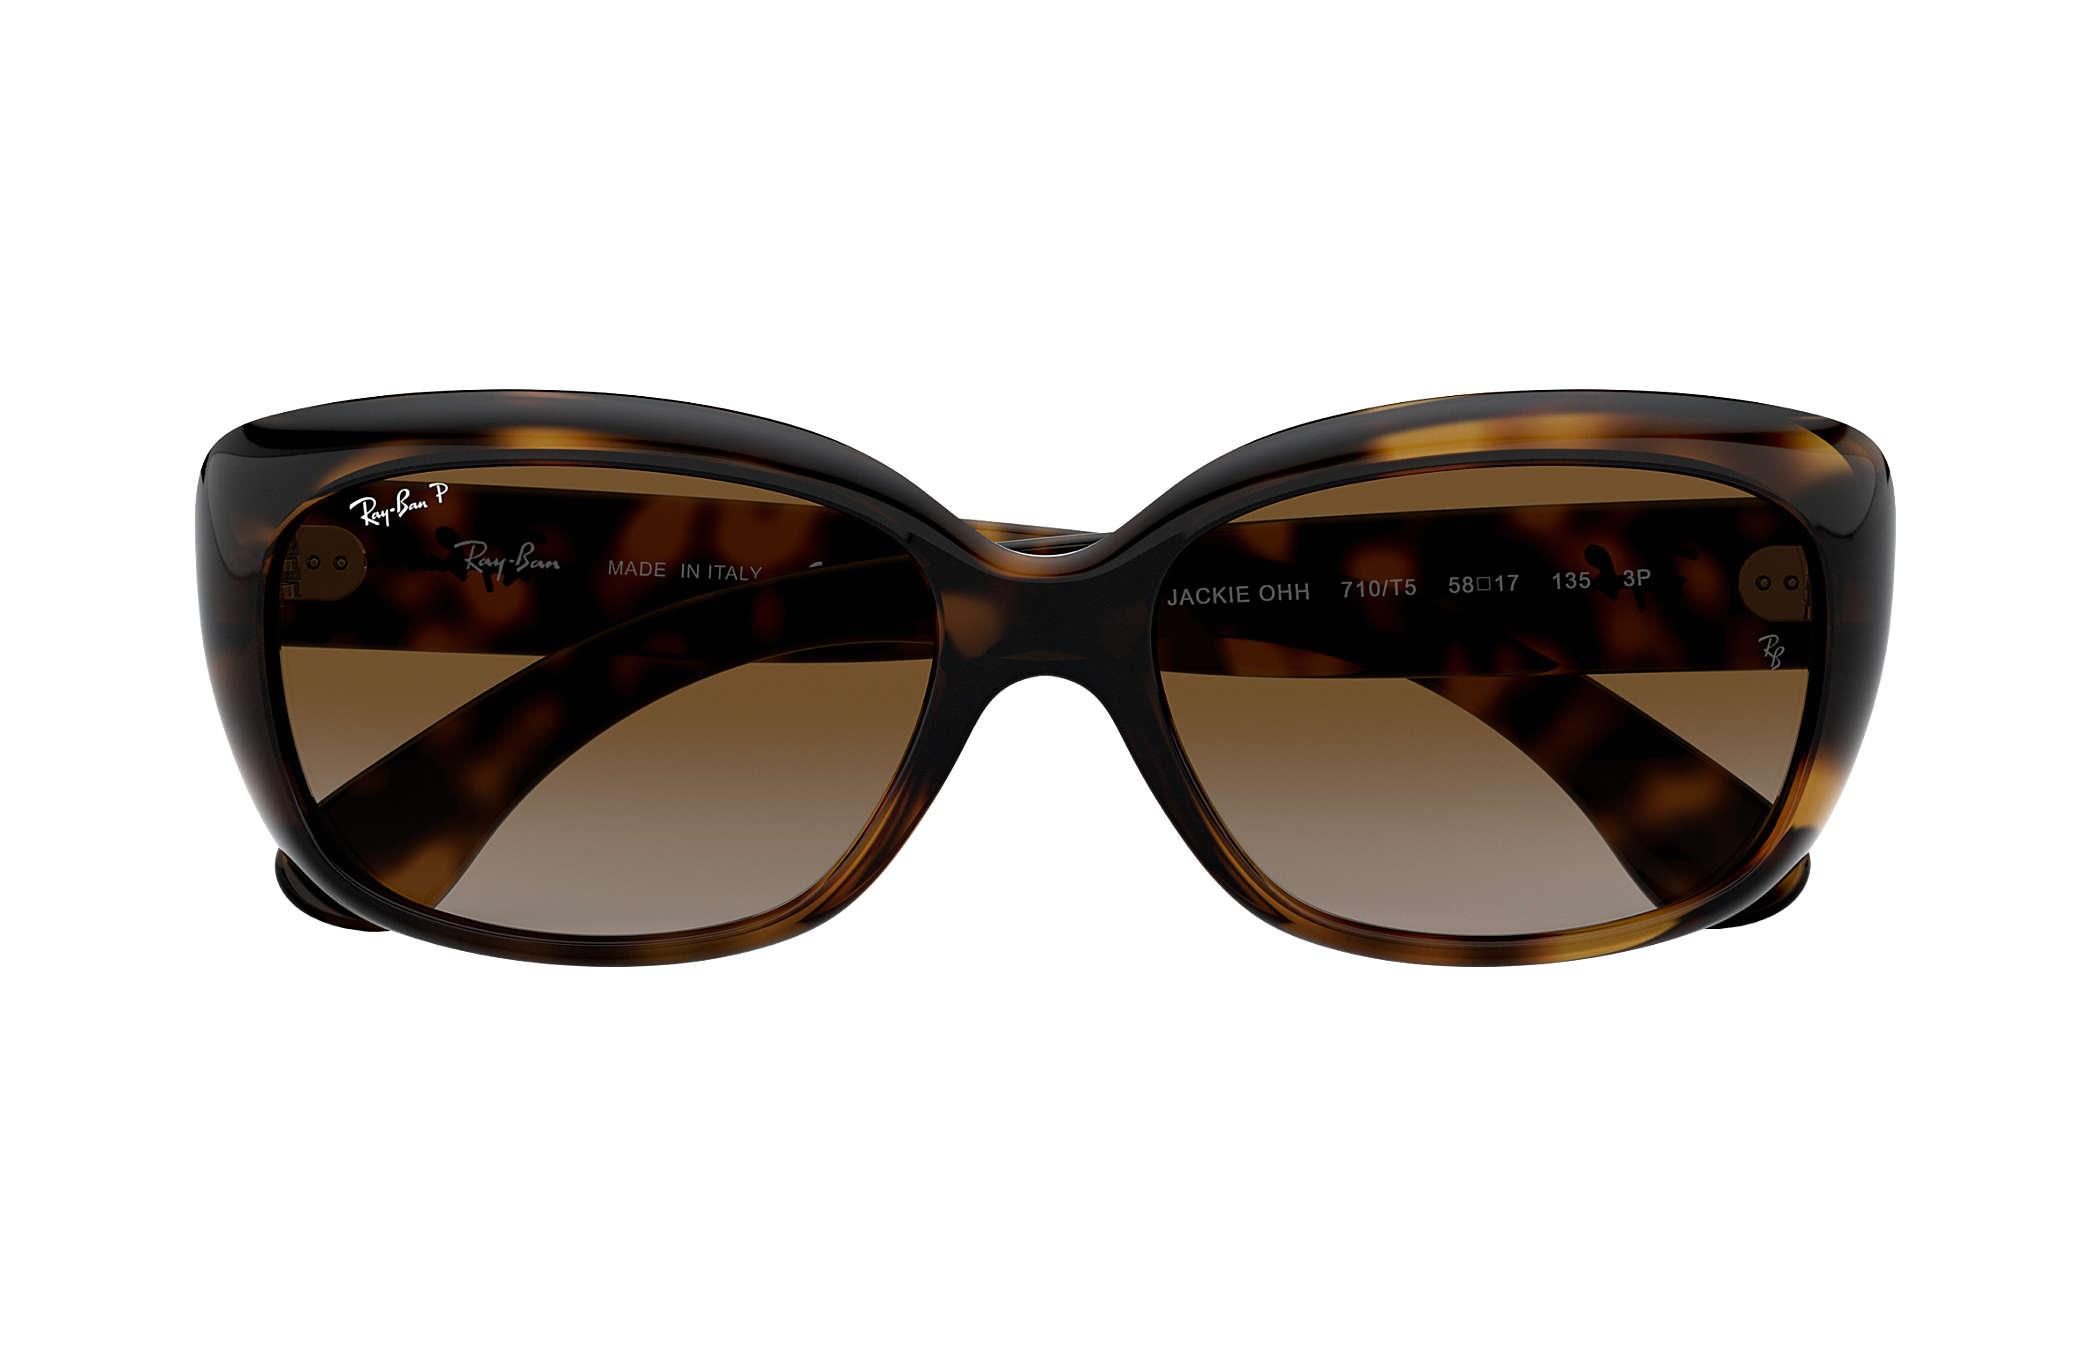 a253f4c5c9ad9 Ray-Ban Jackie Ohh RB4101 Tortoise - Nylon - Brown Polarized Lenses ...